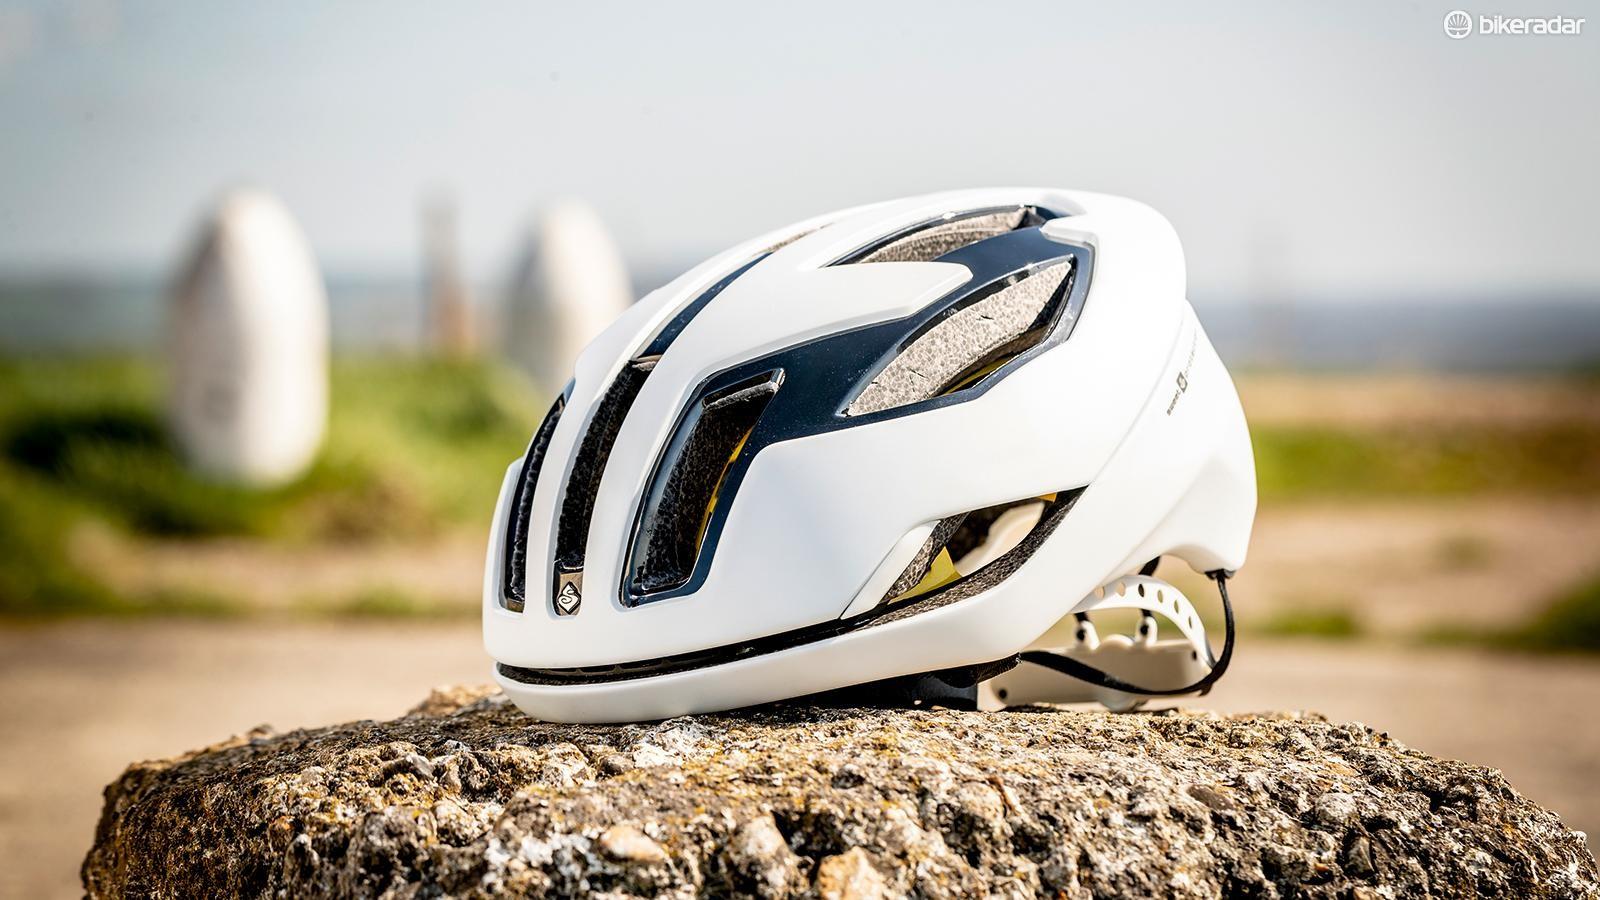 Sweet Protection's Falconer MIPS helmet